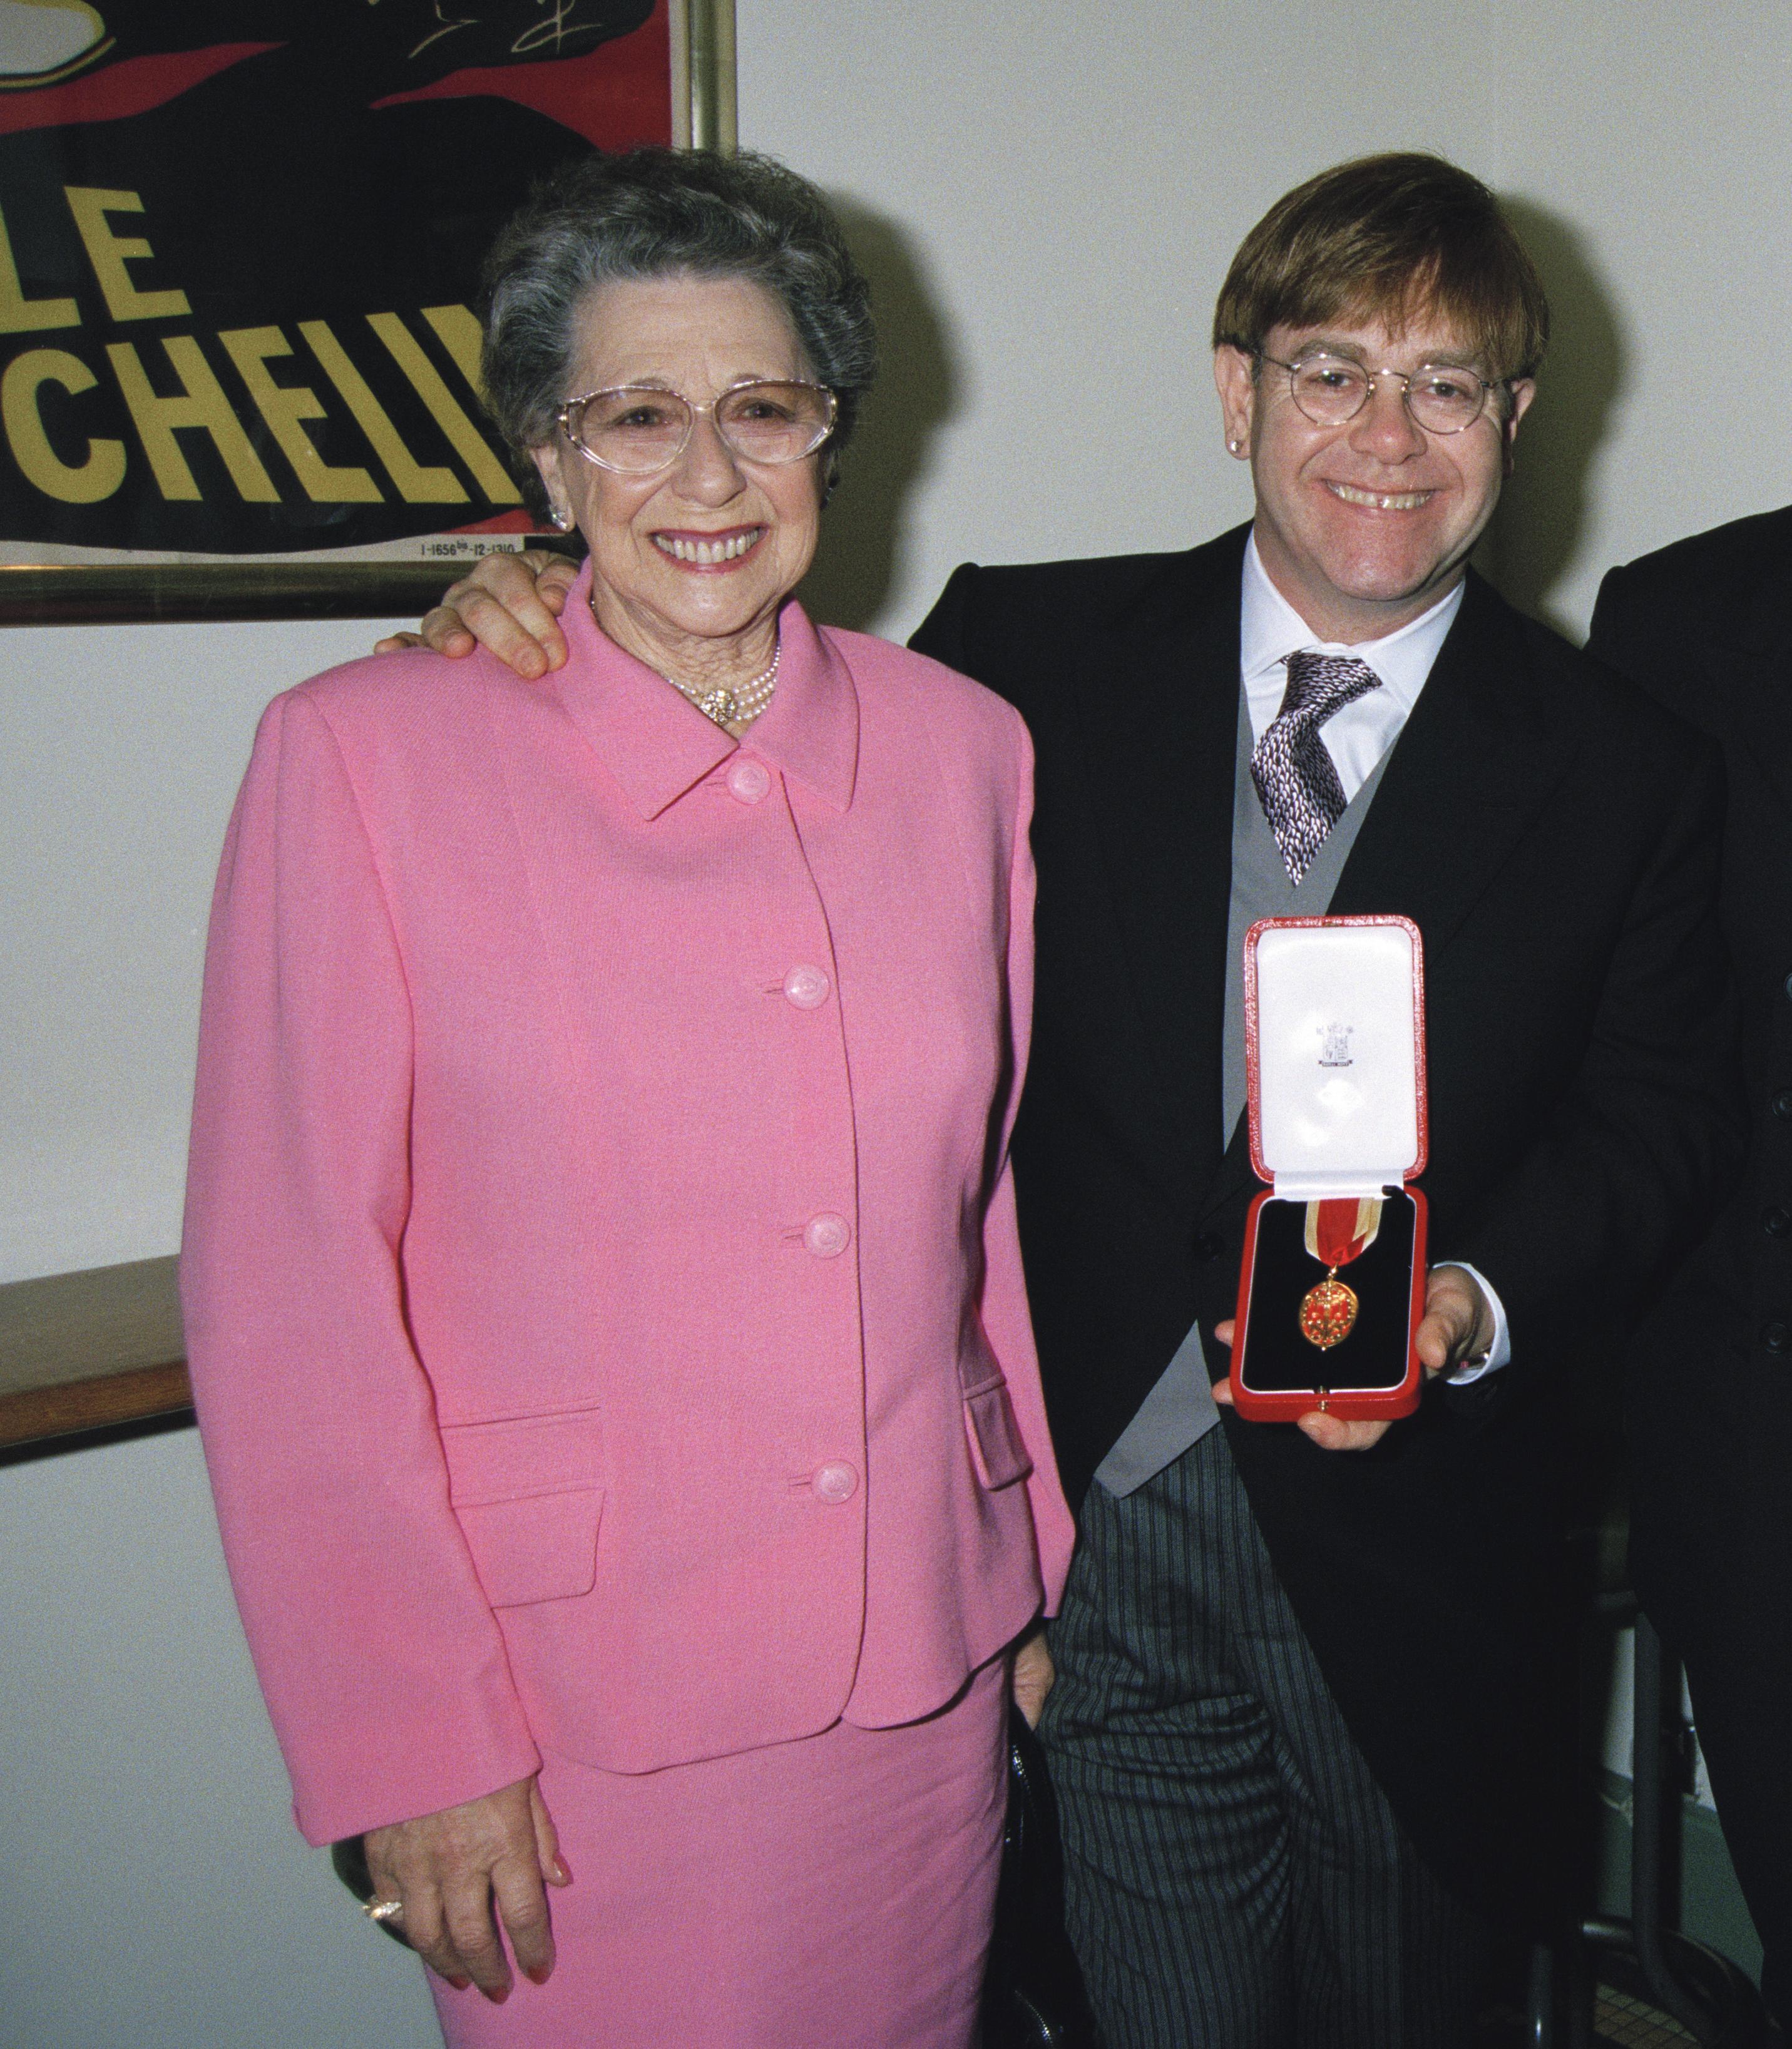 Elton John Mom Getty Images